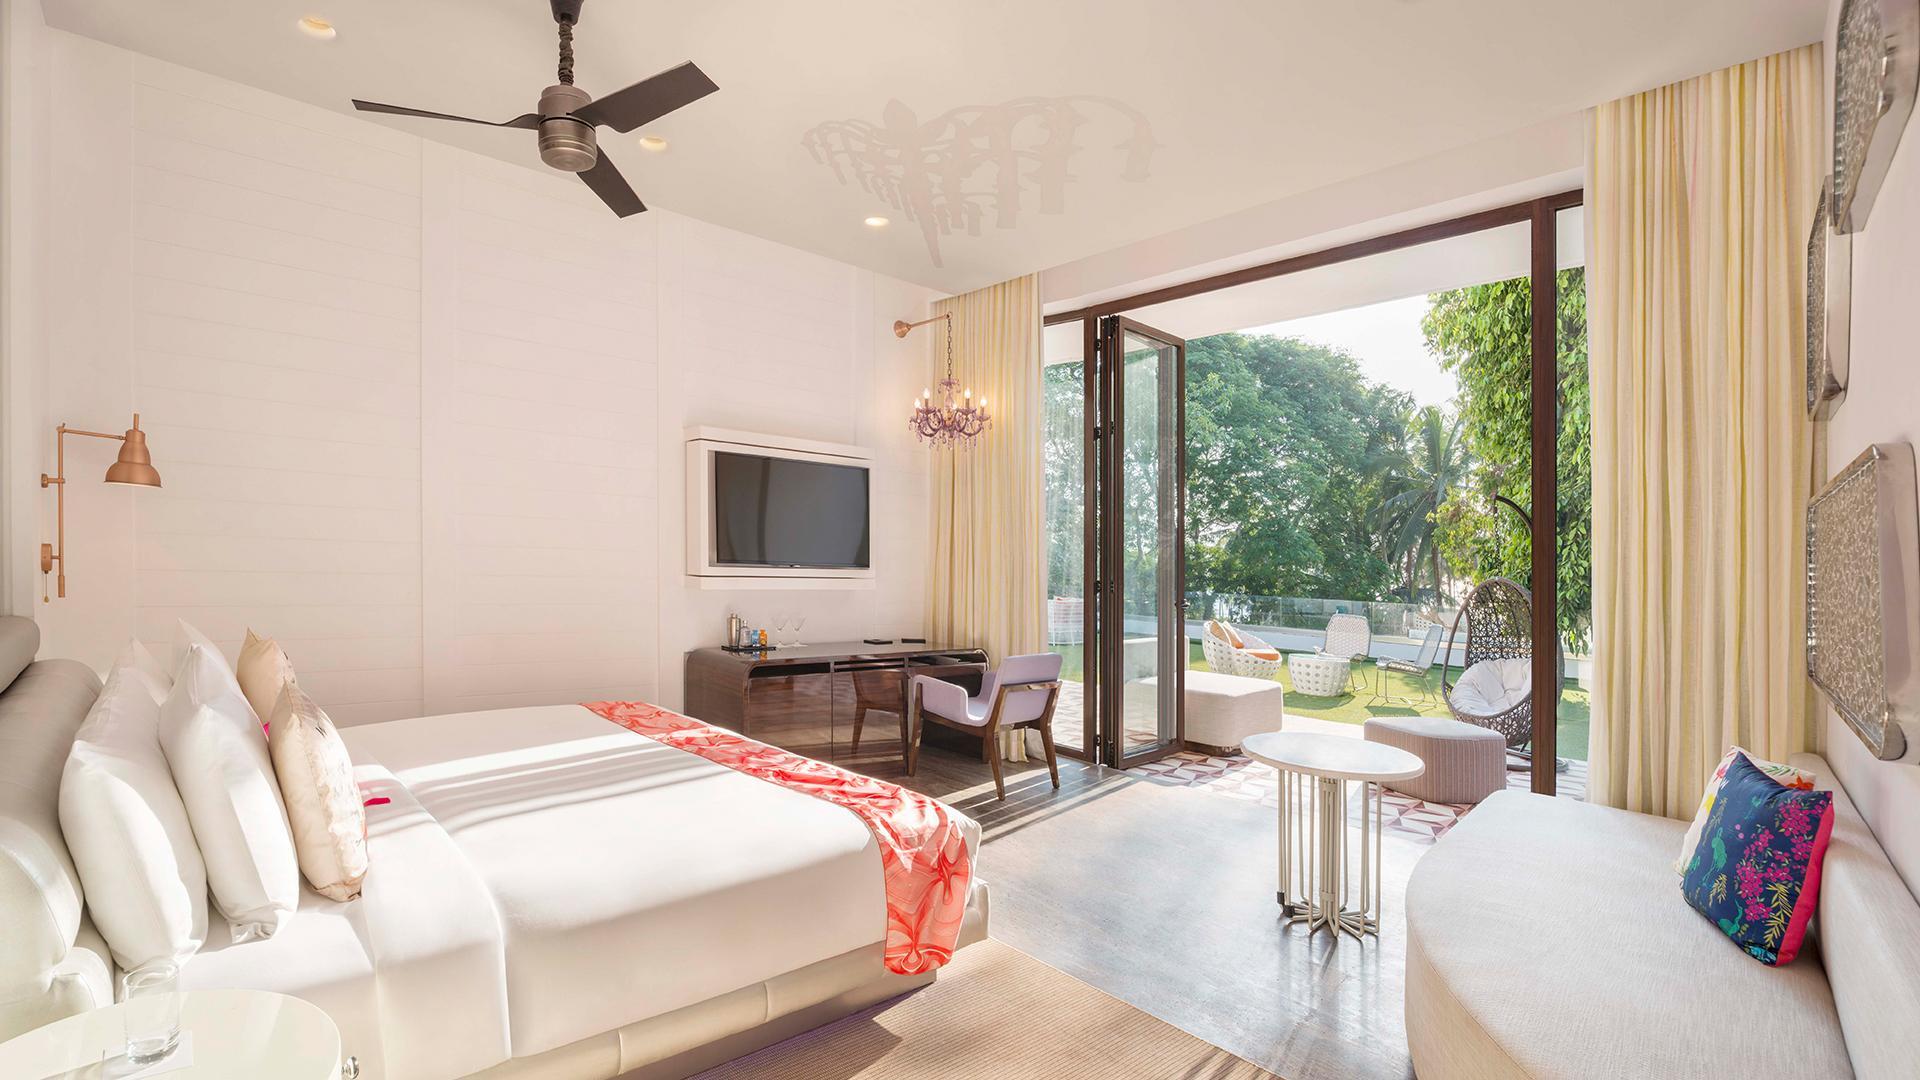 Spectacular Room image 1 at W Goa by North Goa, Goa, India